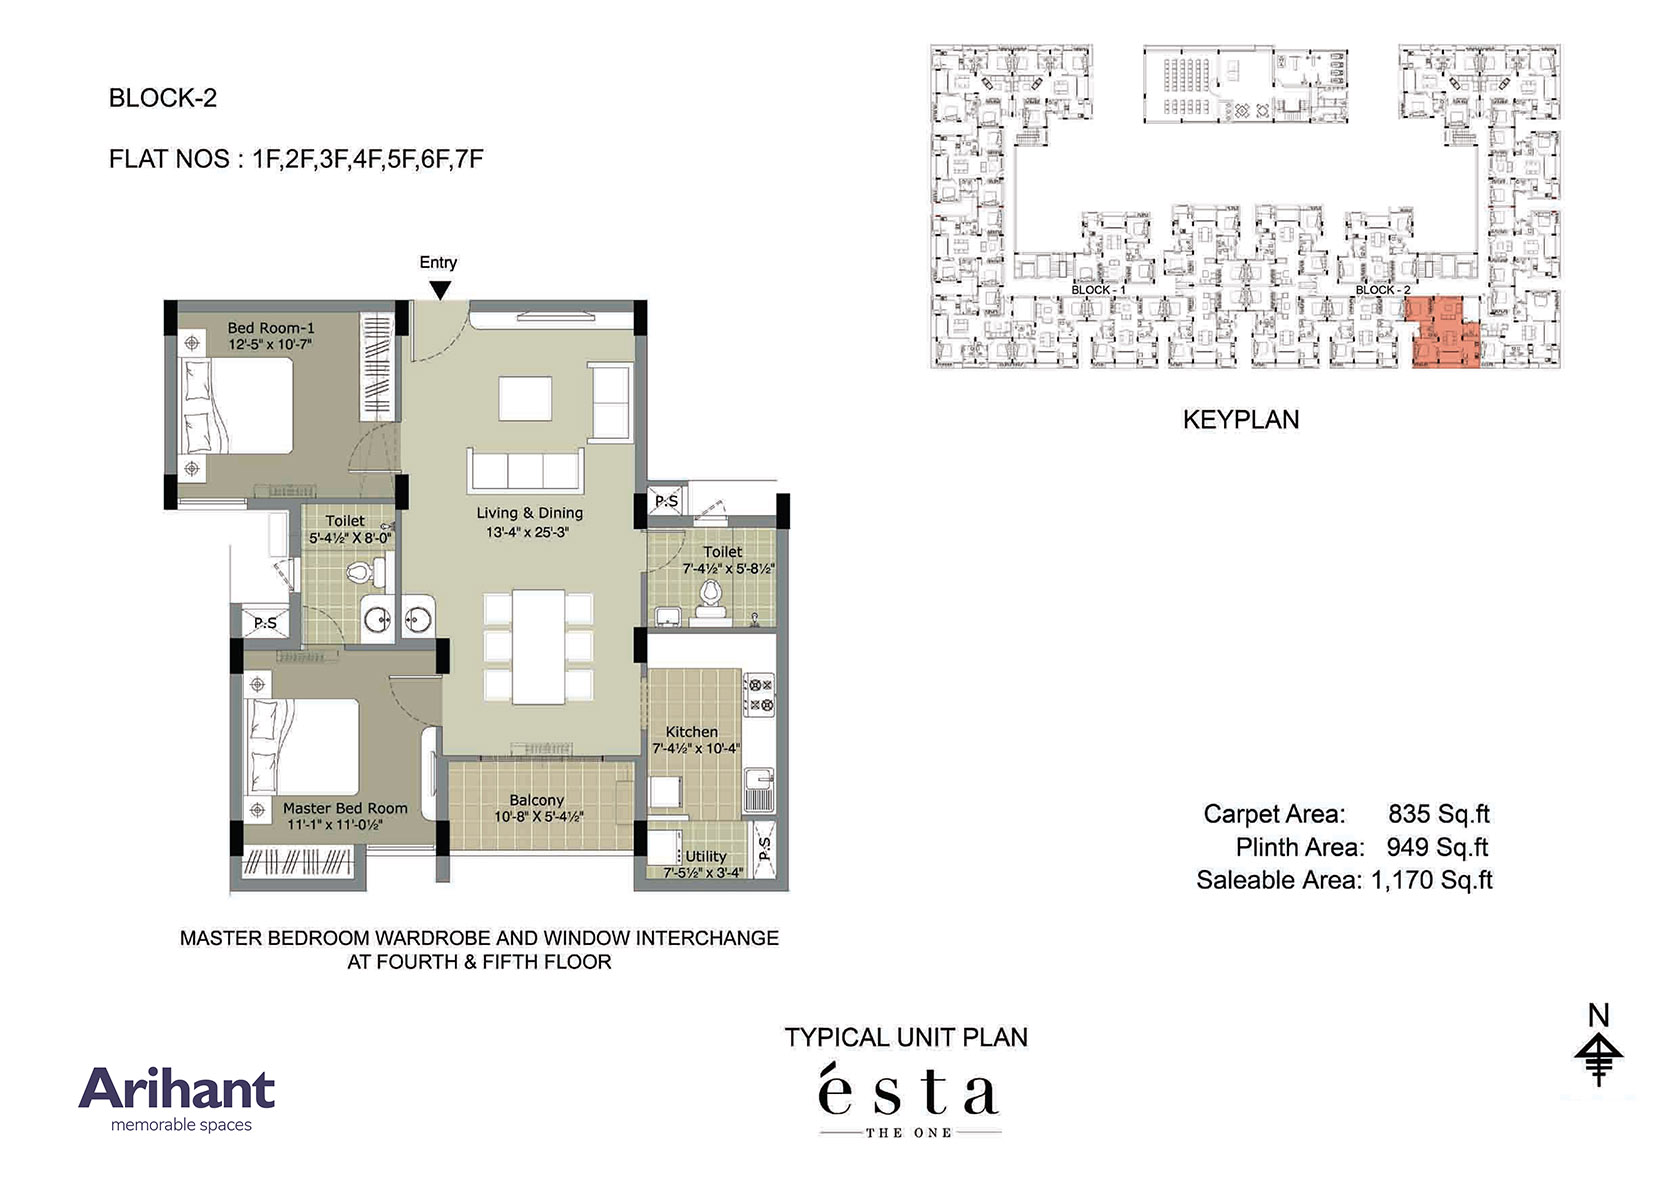 Arihant - Esta_Typical Unit Plan - Block 2 - Type F